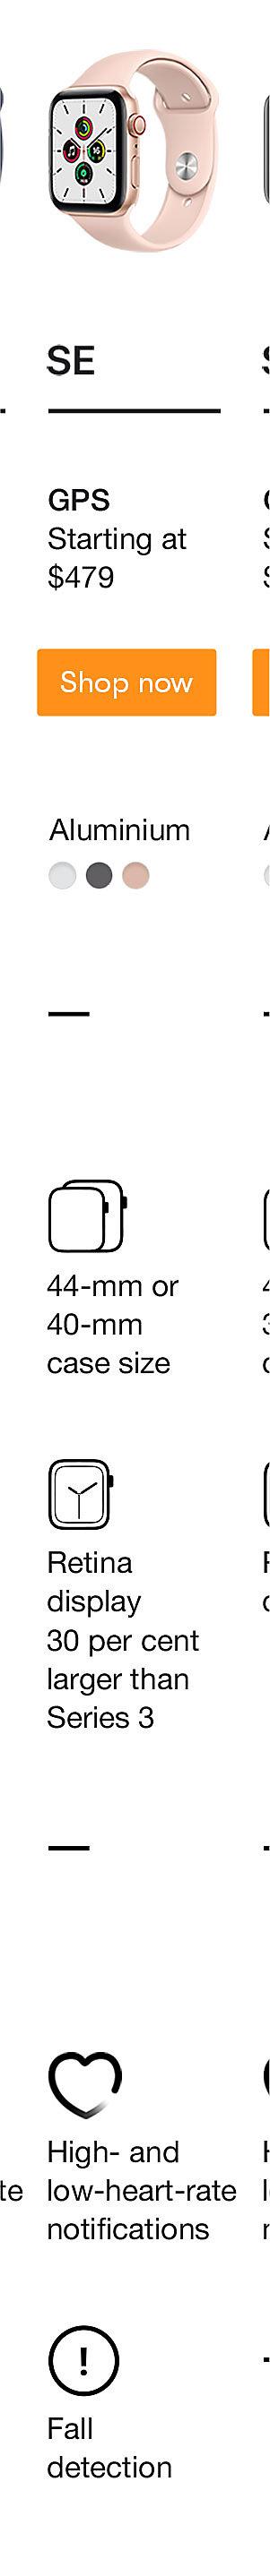 Apple Watch SE Shop Now